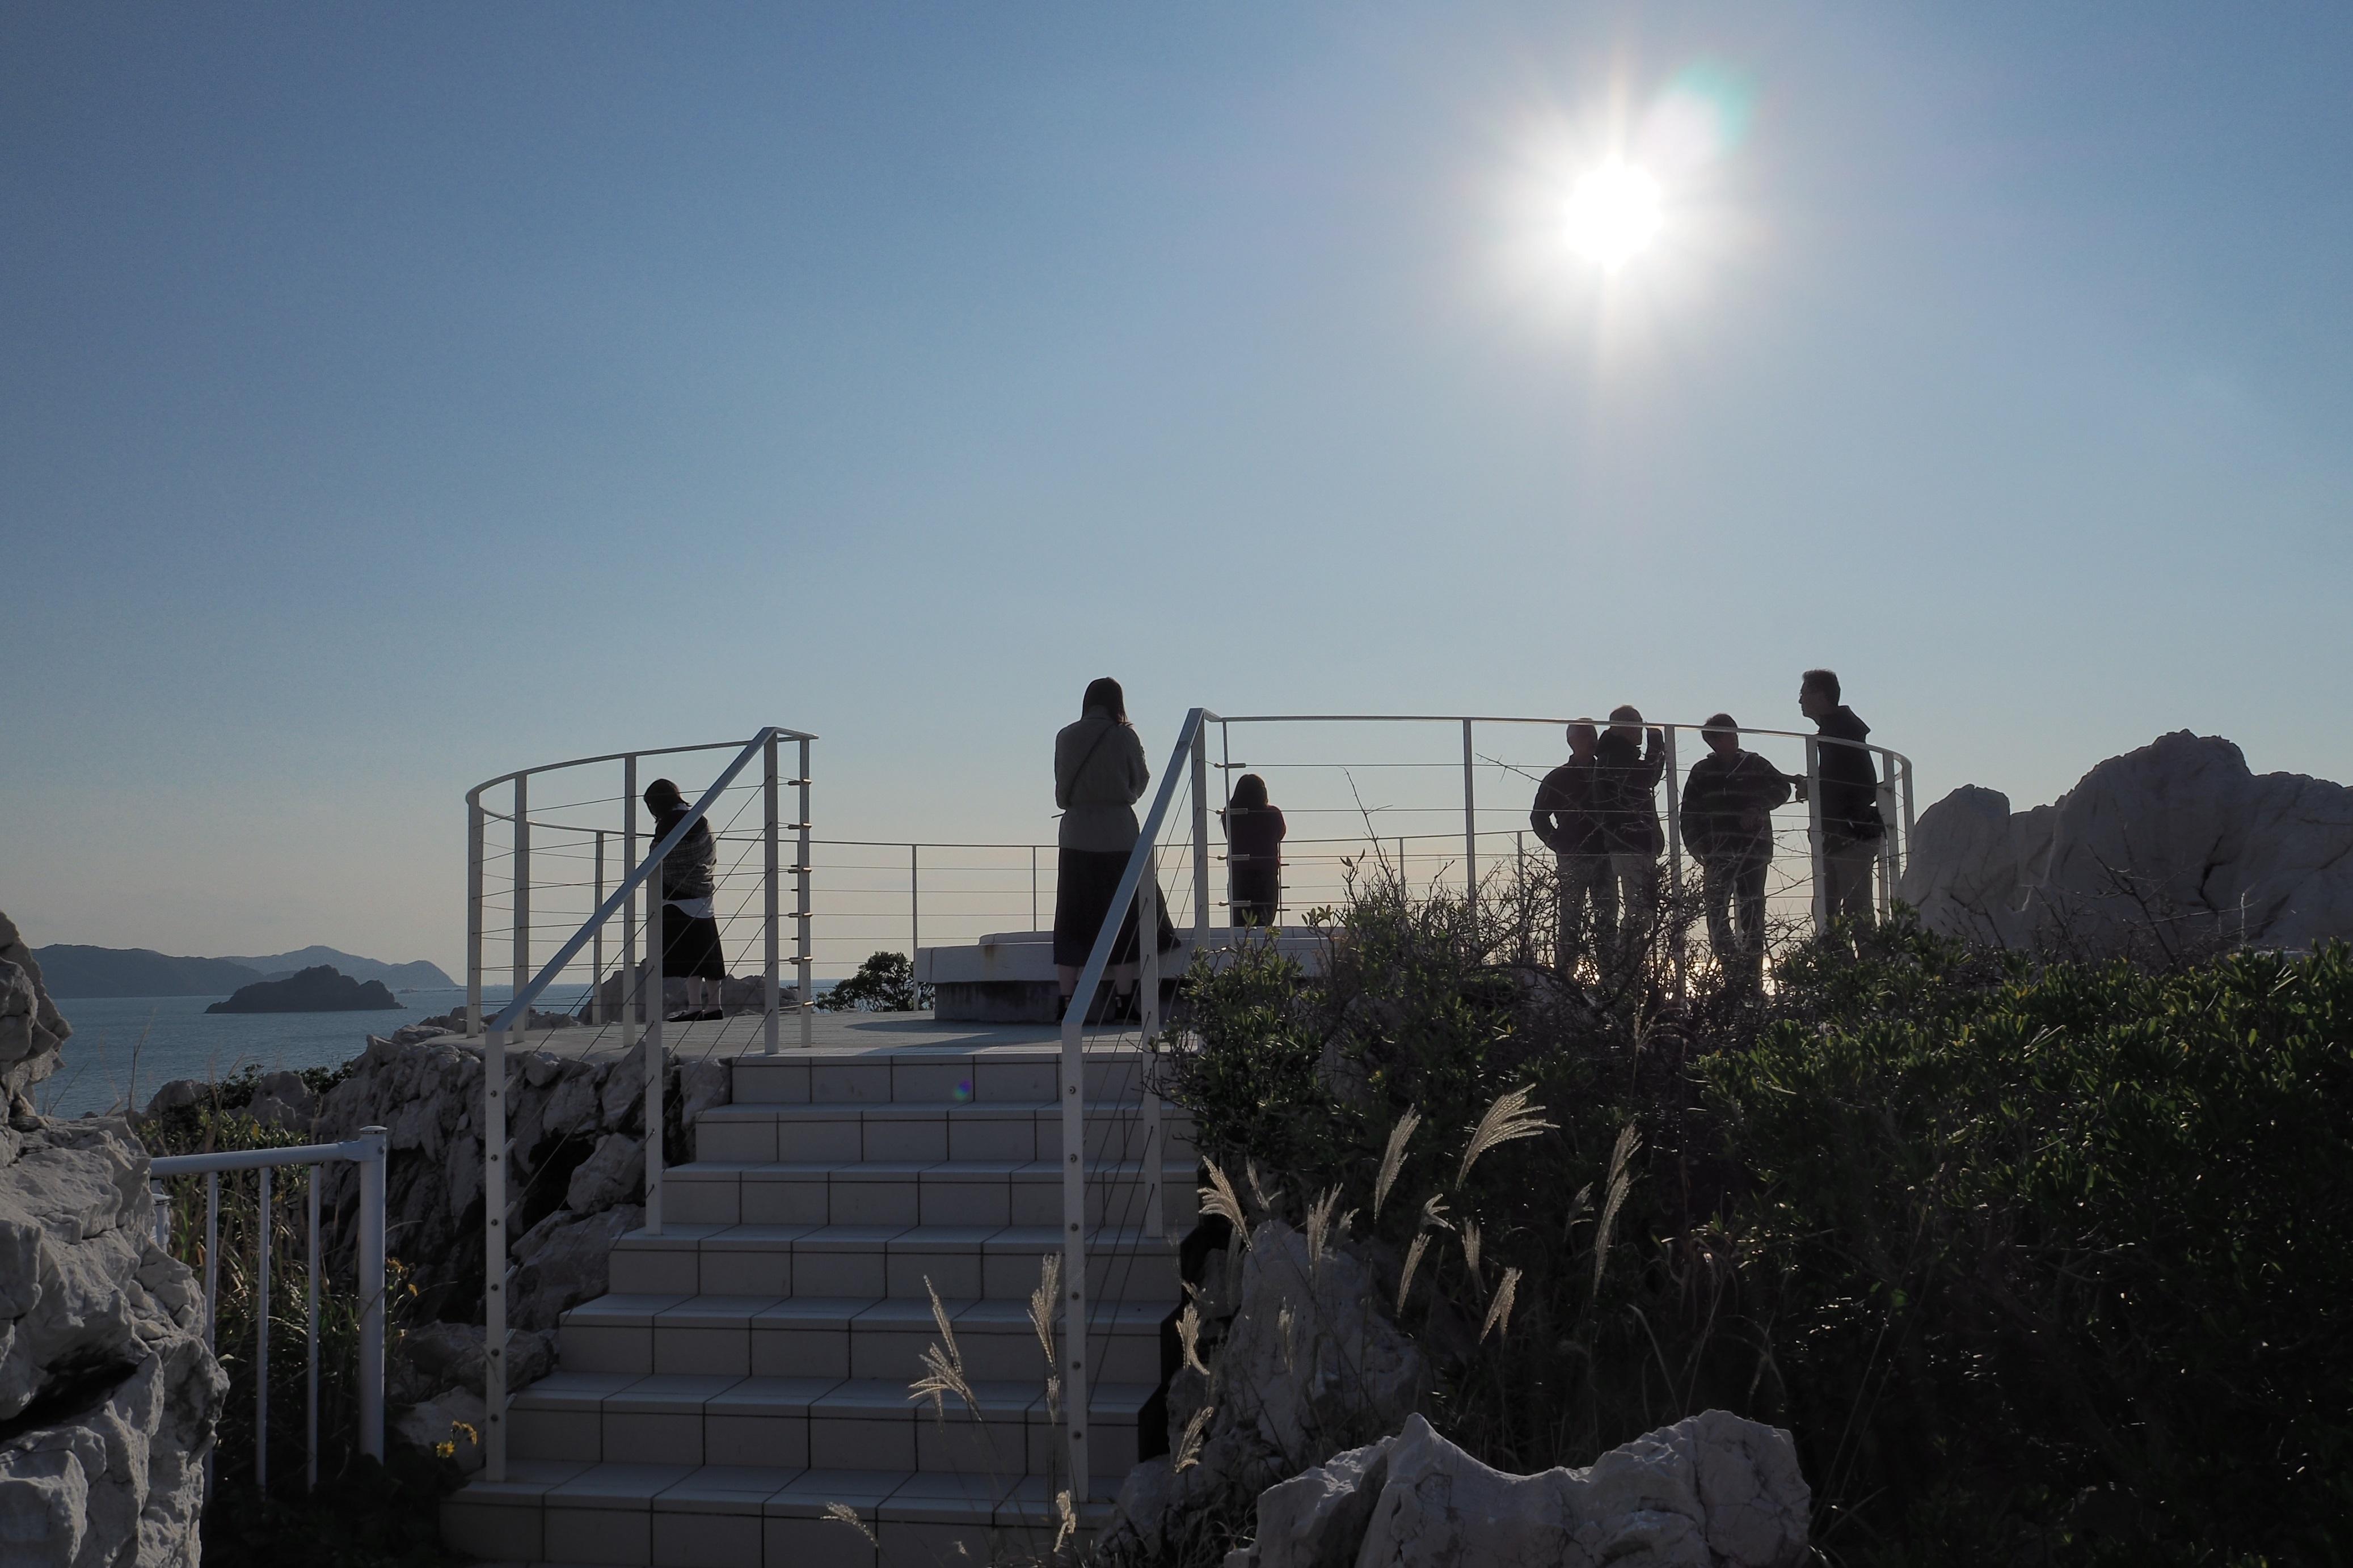 harleydavidson-motorcycle-touring-blog-wakayama-shirasakioceanpark-limestone-observatory-2.jpg